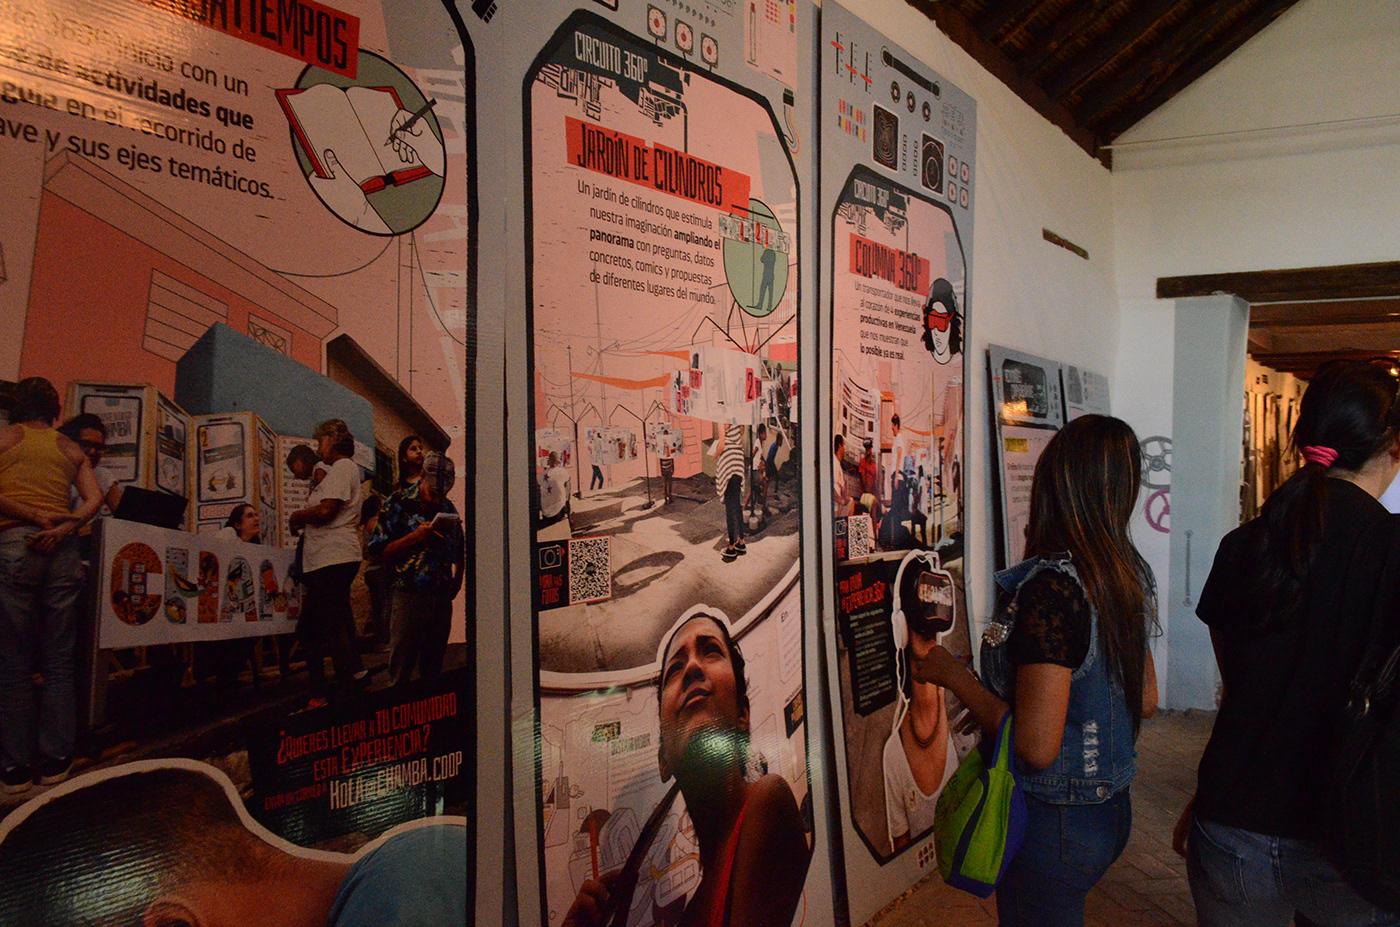 Cooperativa cooperative socialism Work  venezuela capitalism 360° Video social design Chamba   youth